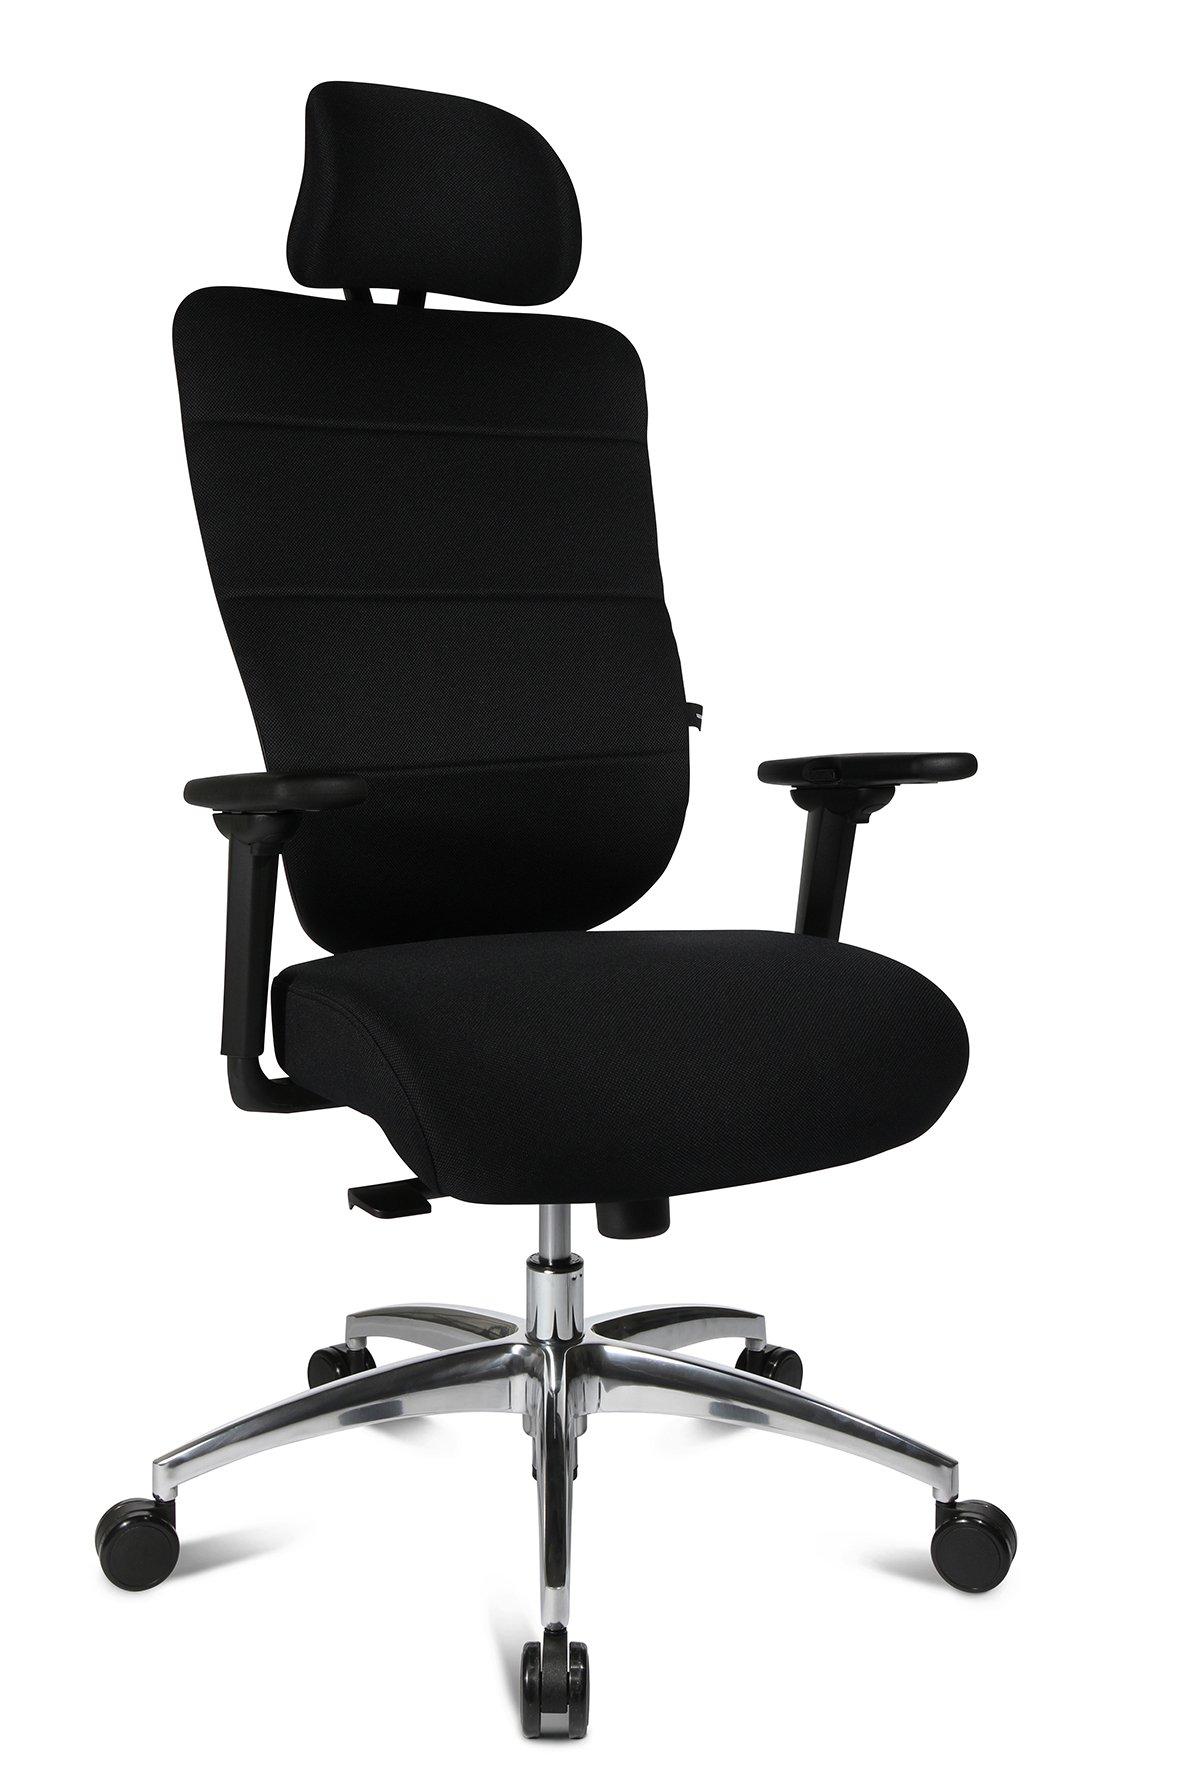 Drehstuhl Ortho Sedis Comfort 30,schwarz,Aluminium